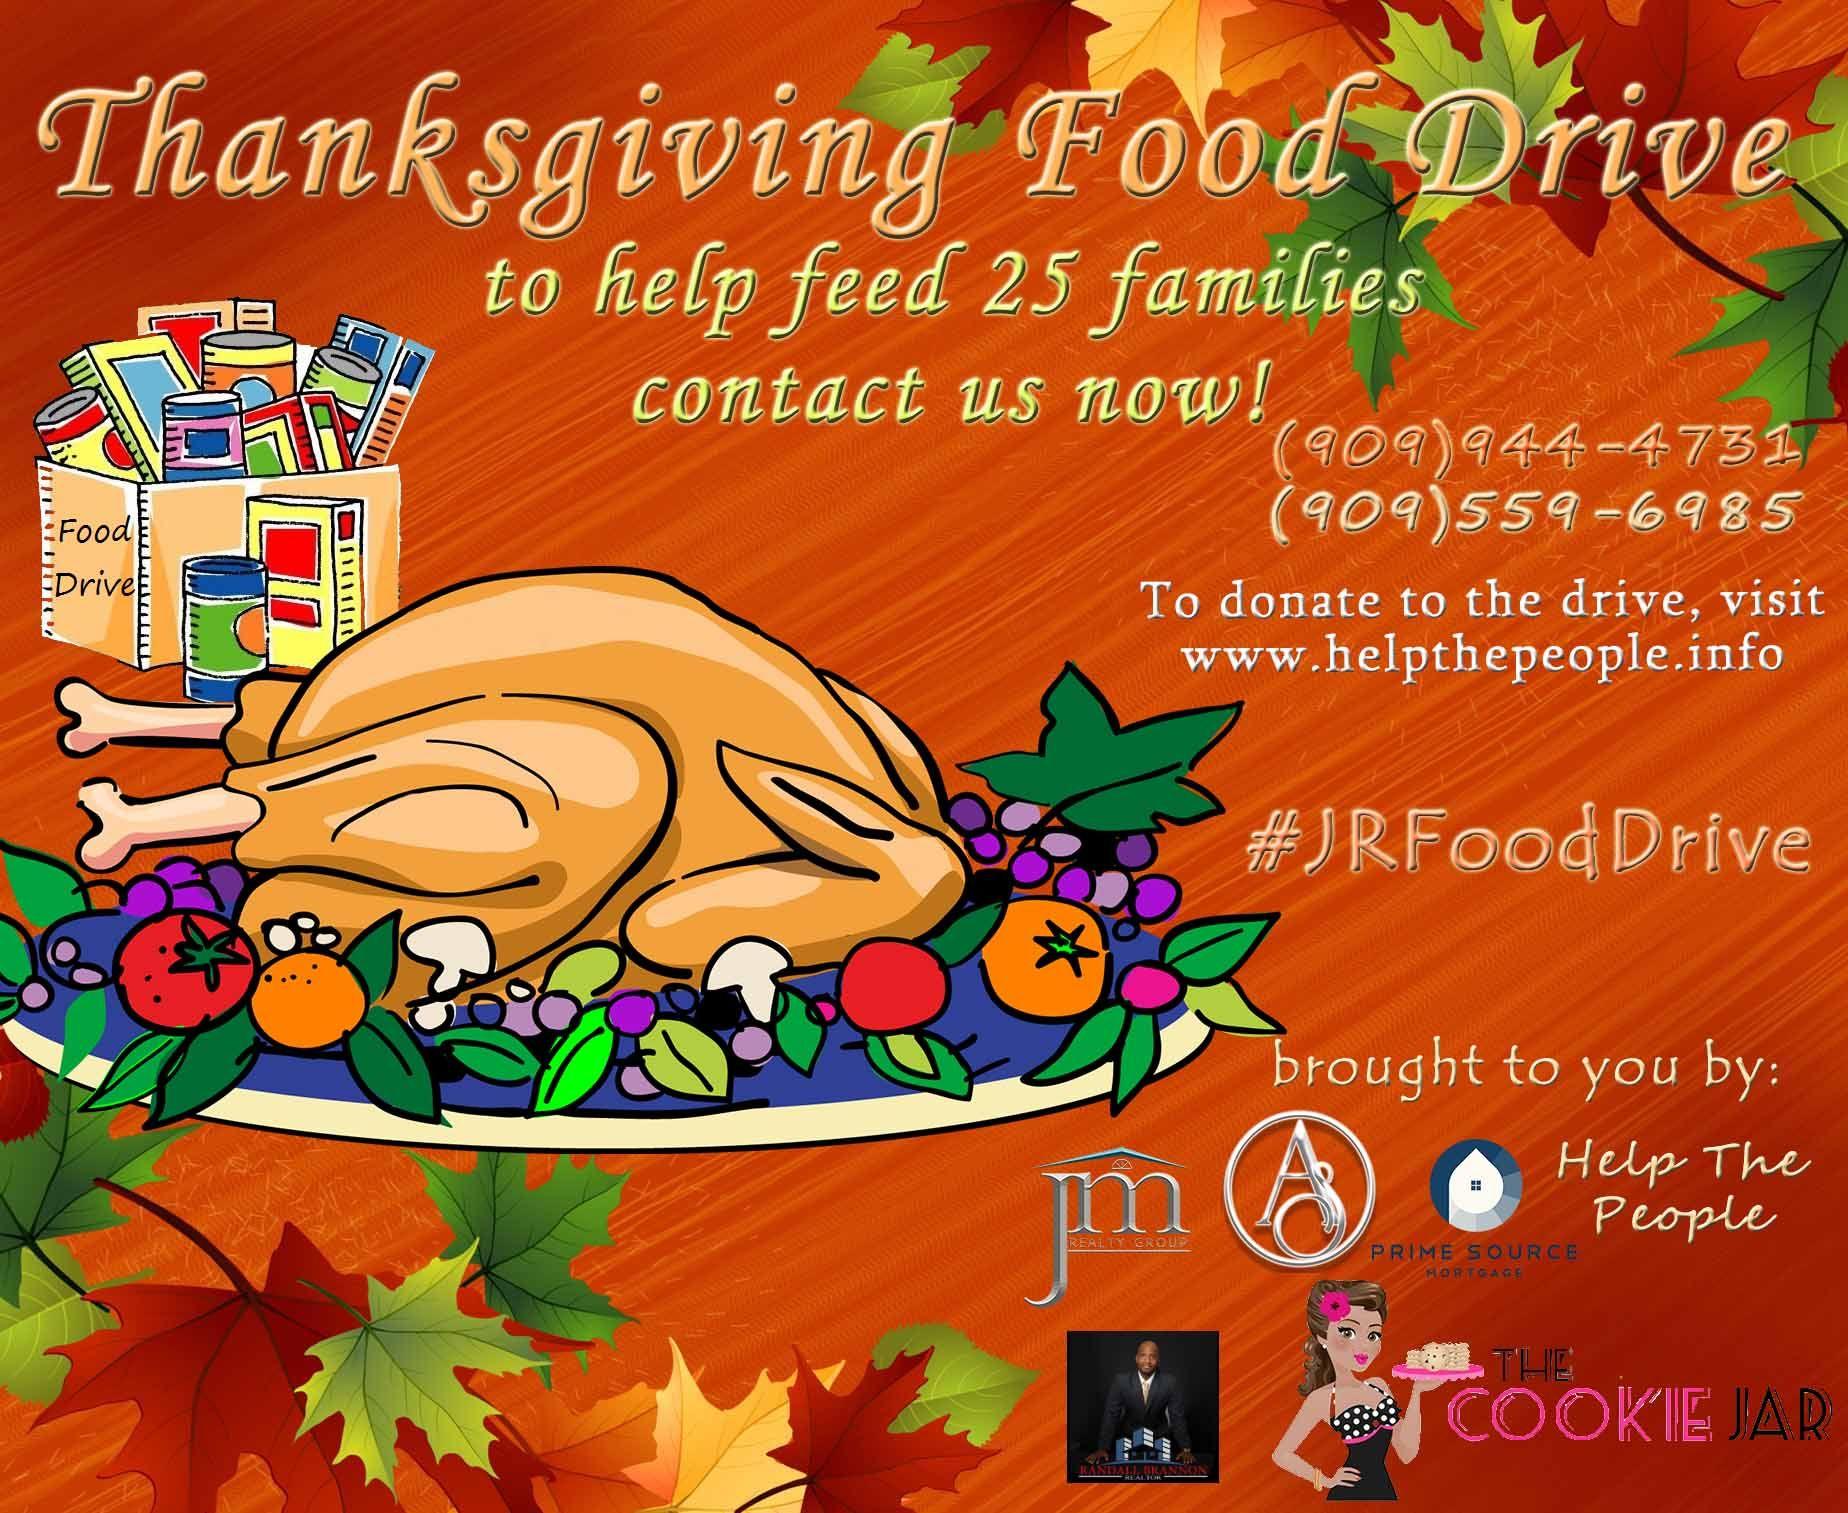 Thanksgiving Food Drive JRFoodDrive Foodgiveaway Thanksgivingfooddrive Freefood Ranchocucamonga